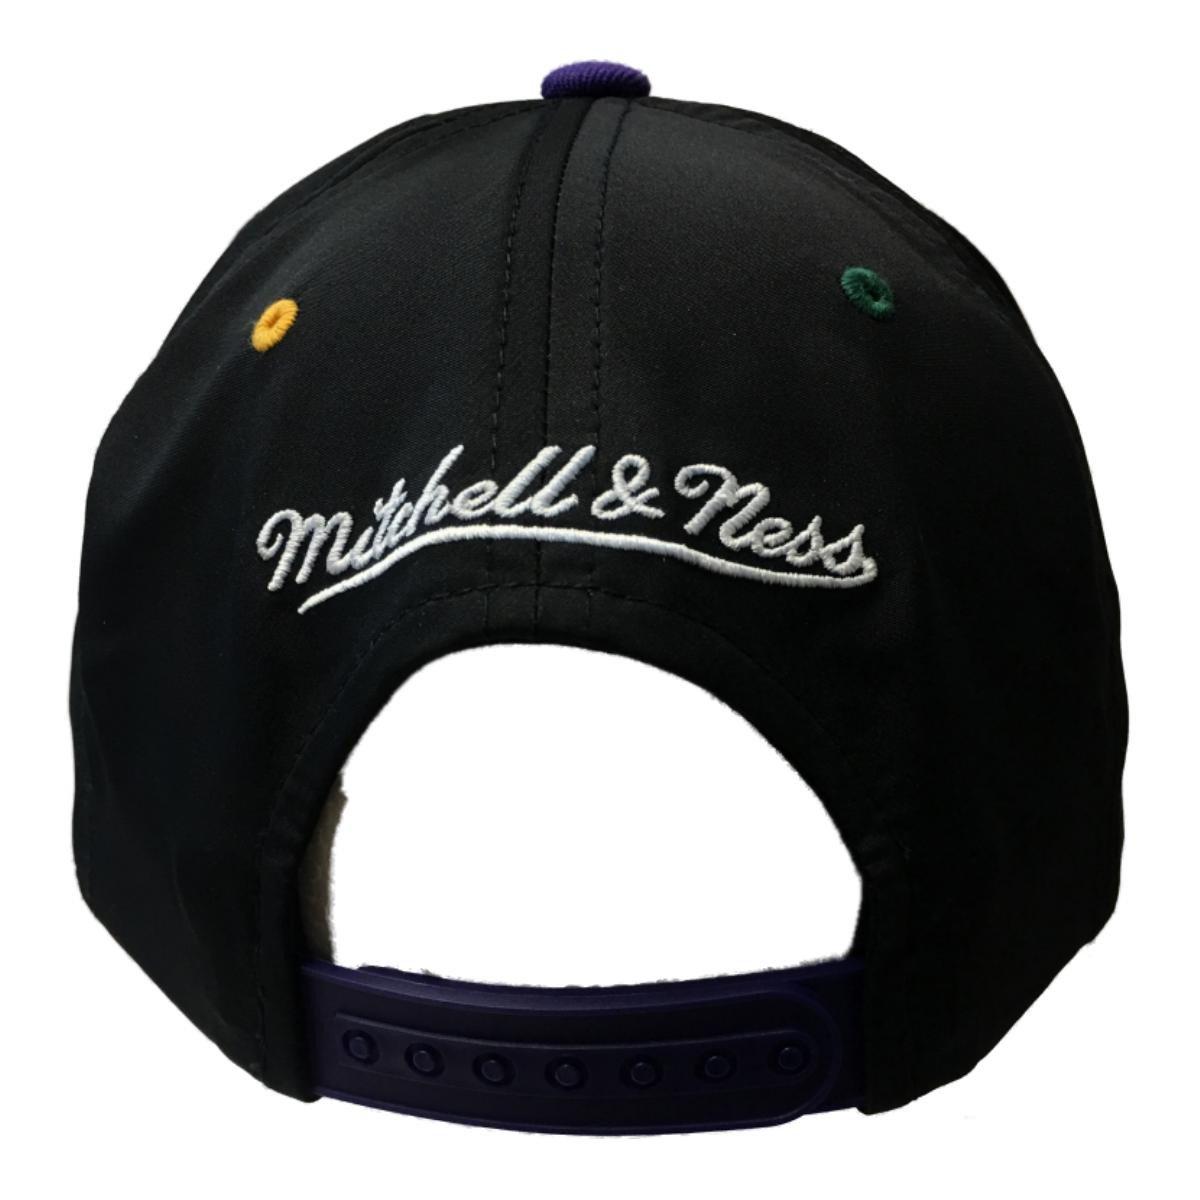 36ec44f2 SUMMER STAPLES: The Footasylum Exclusive Mitchell And Ness Ultimate Snapback.    FOOTASYLUM x Accessories in 2019   Snapback, Mens caps, Caps hats